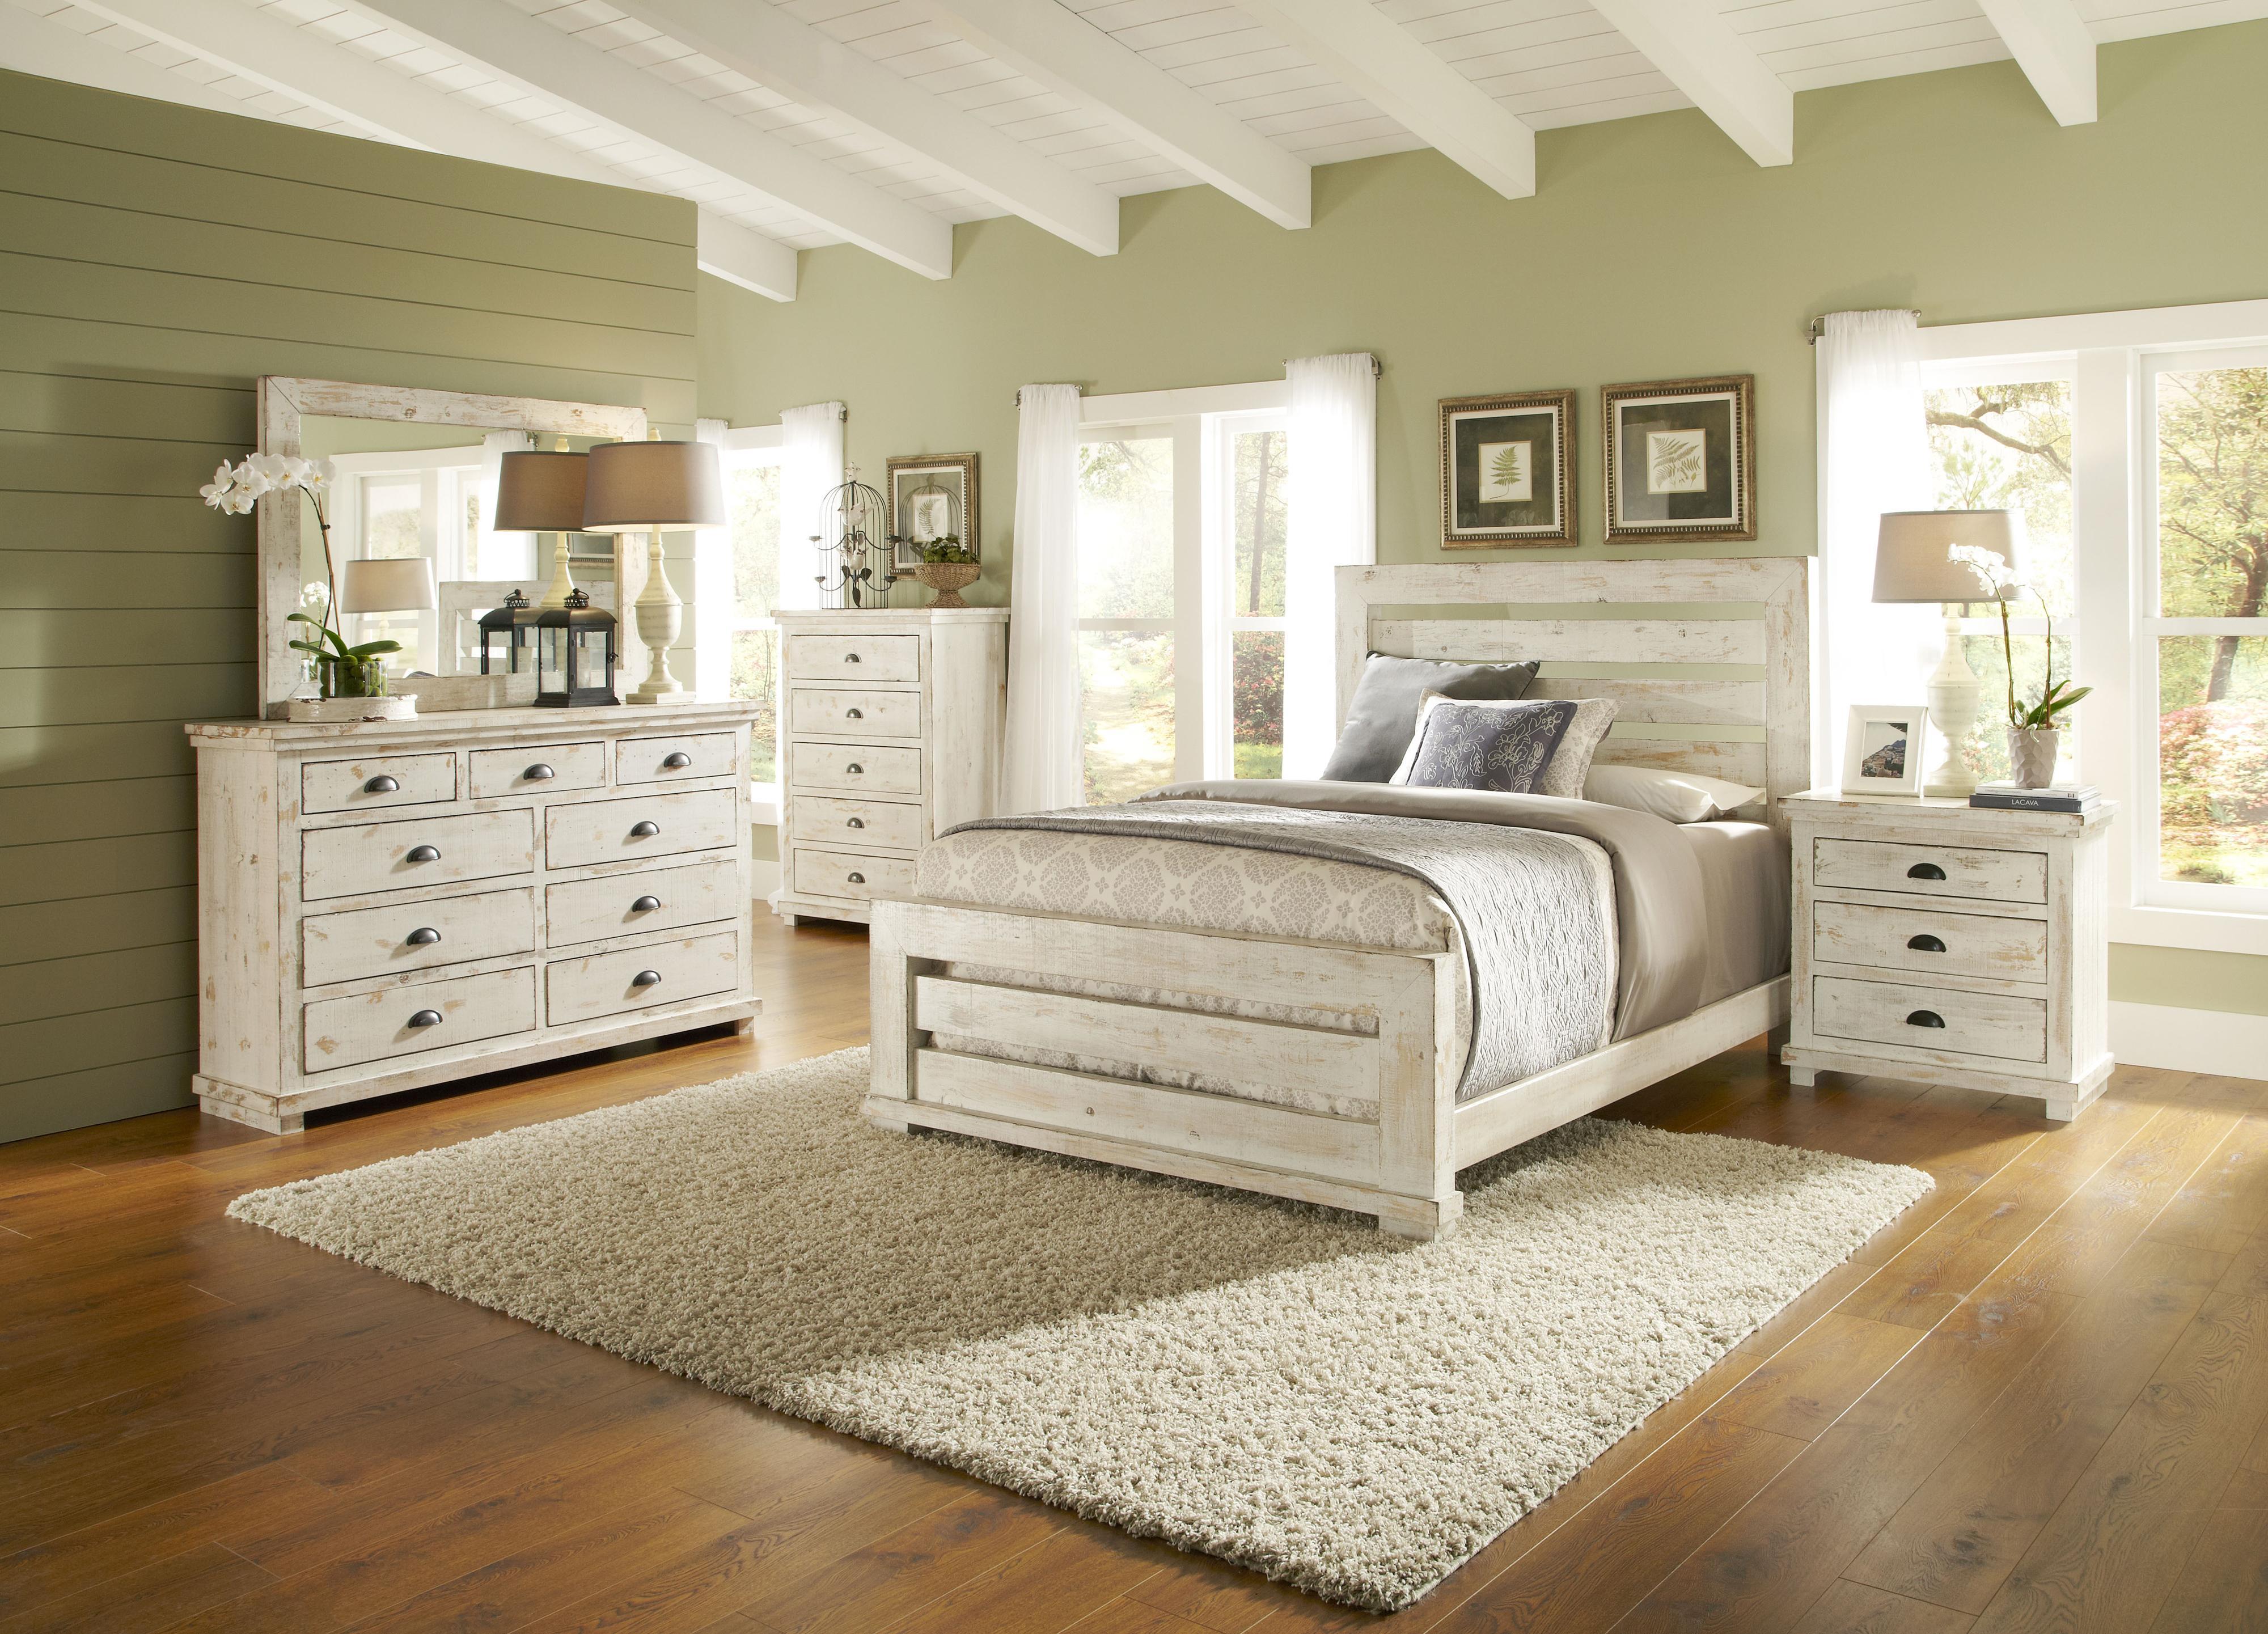 Progressive furniture willow distressed pine nightstand van hill furniture night stands for Distressed pine bedroom furniture